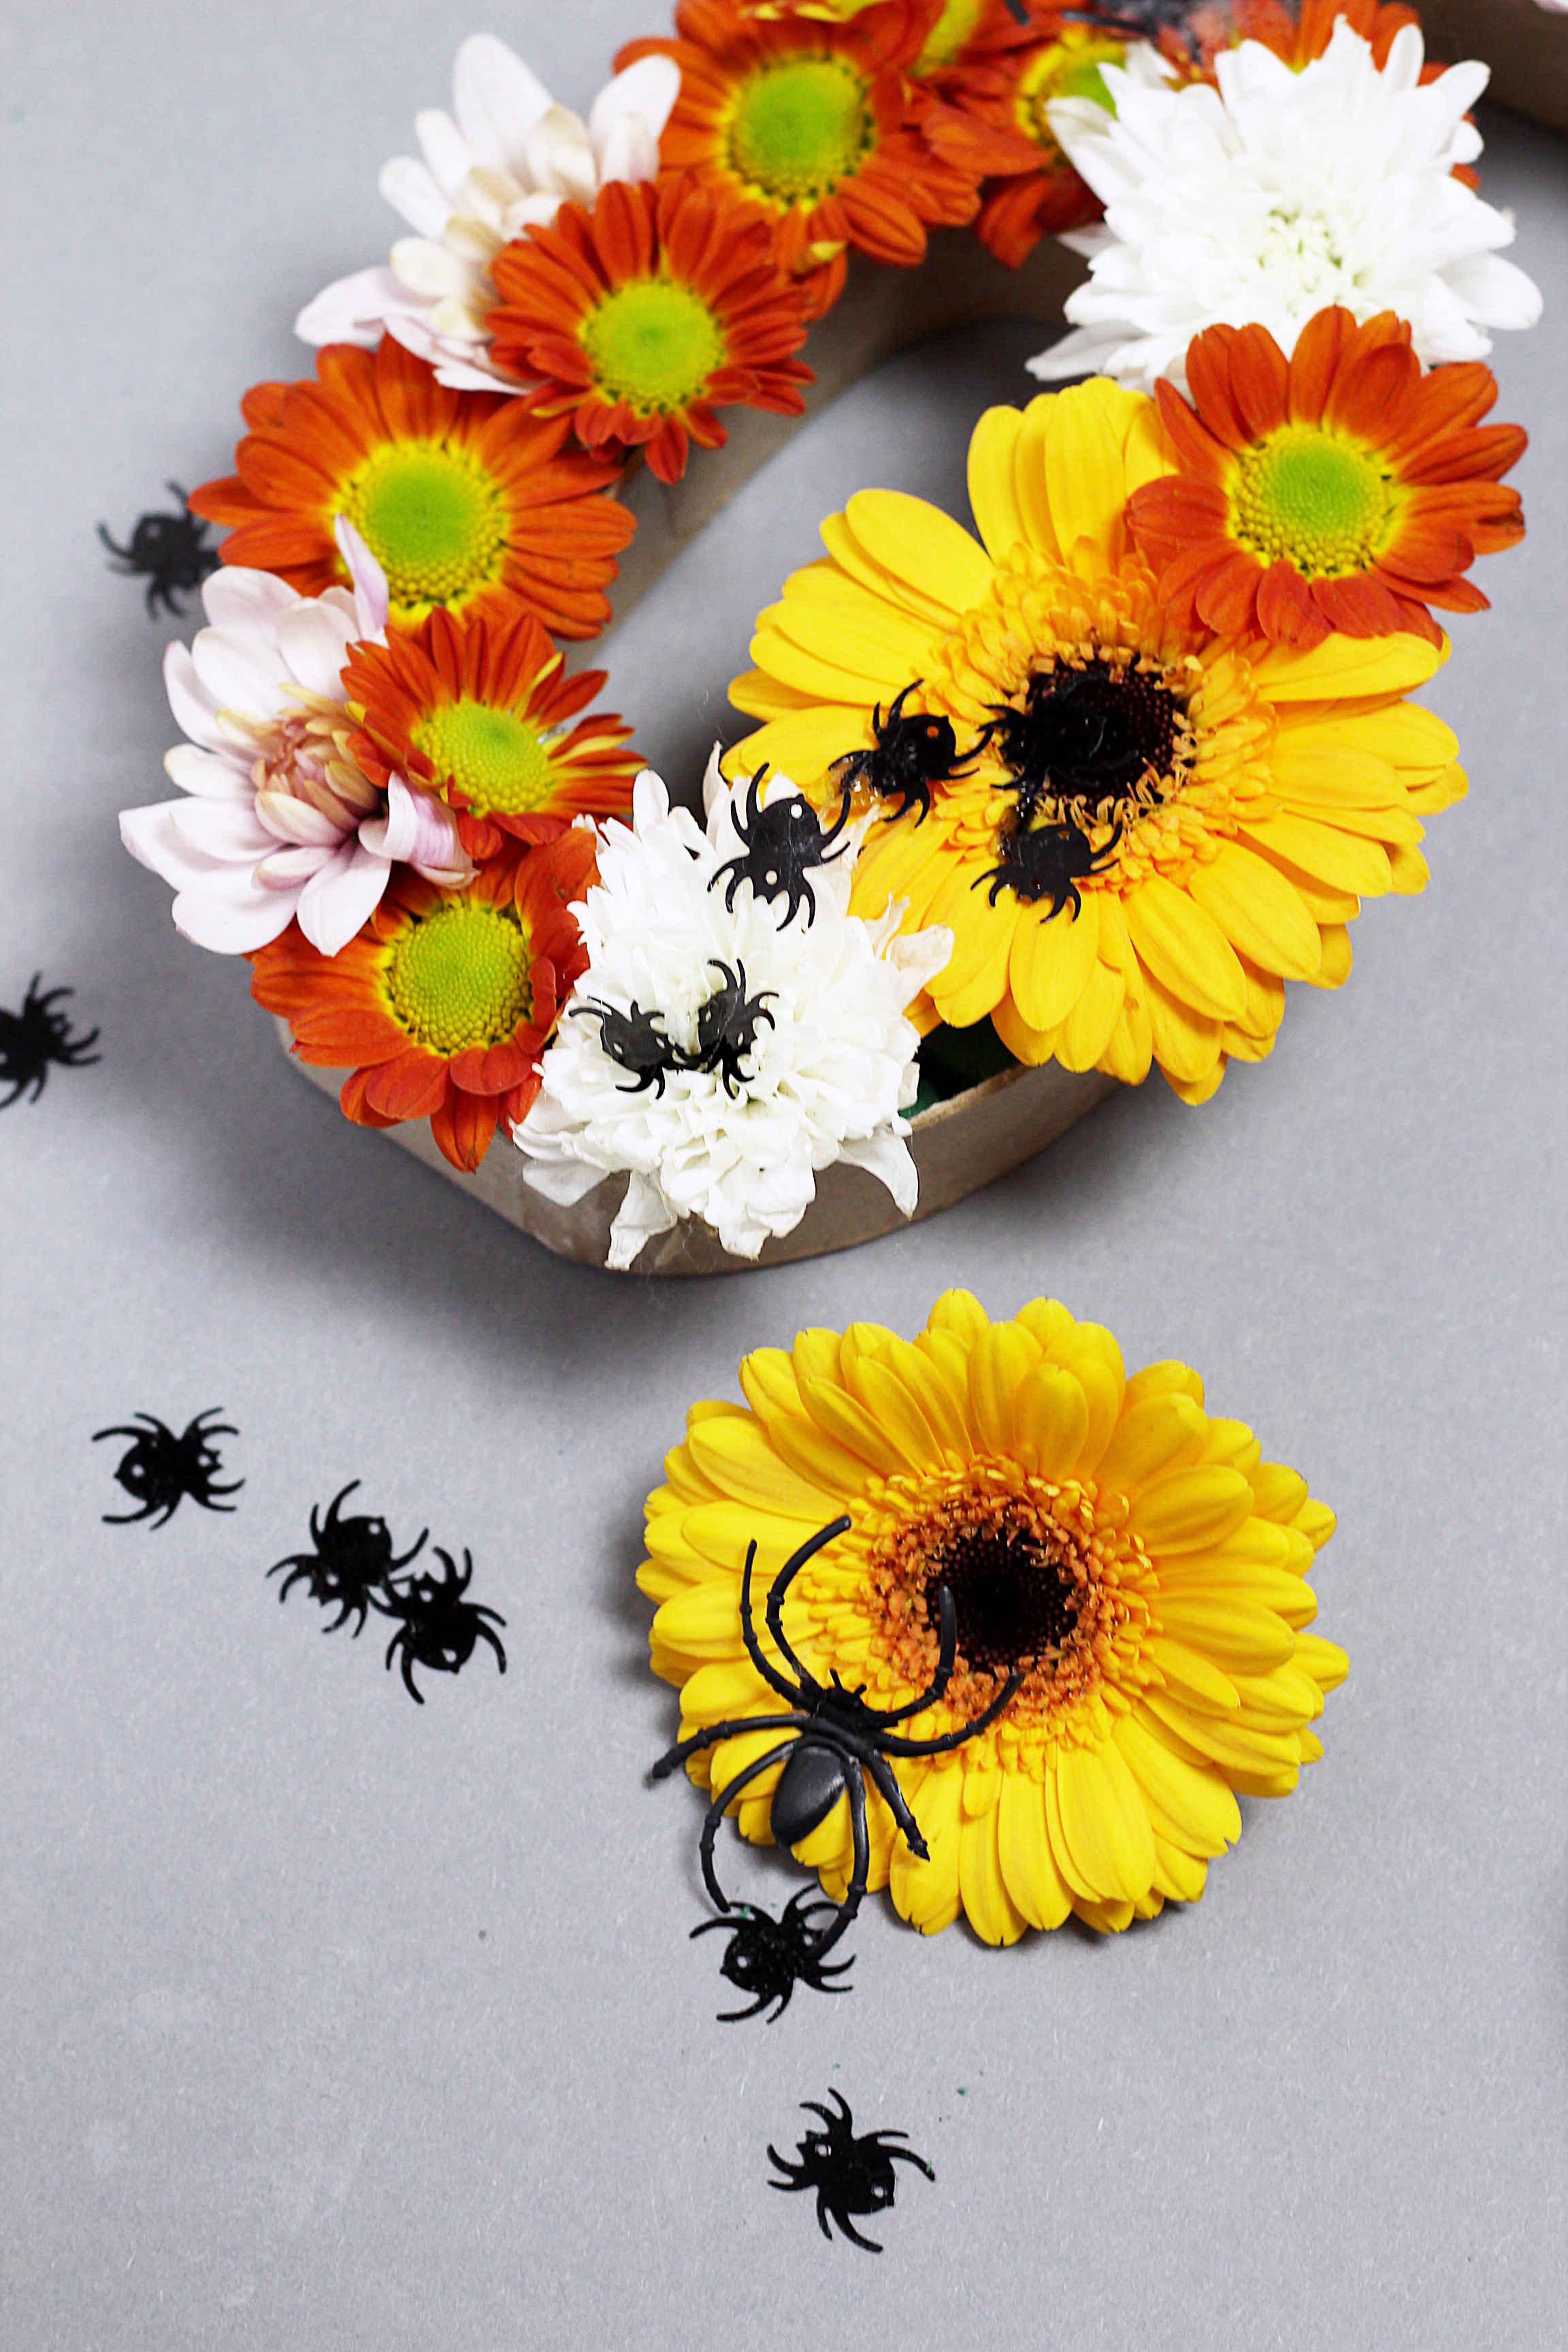 diy halloween deko basteln mit blumen: kreative diy ideen